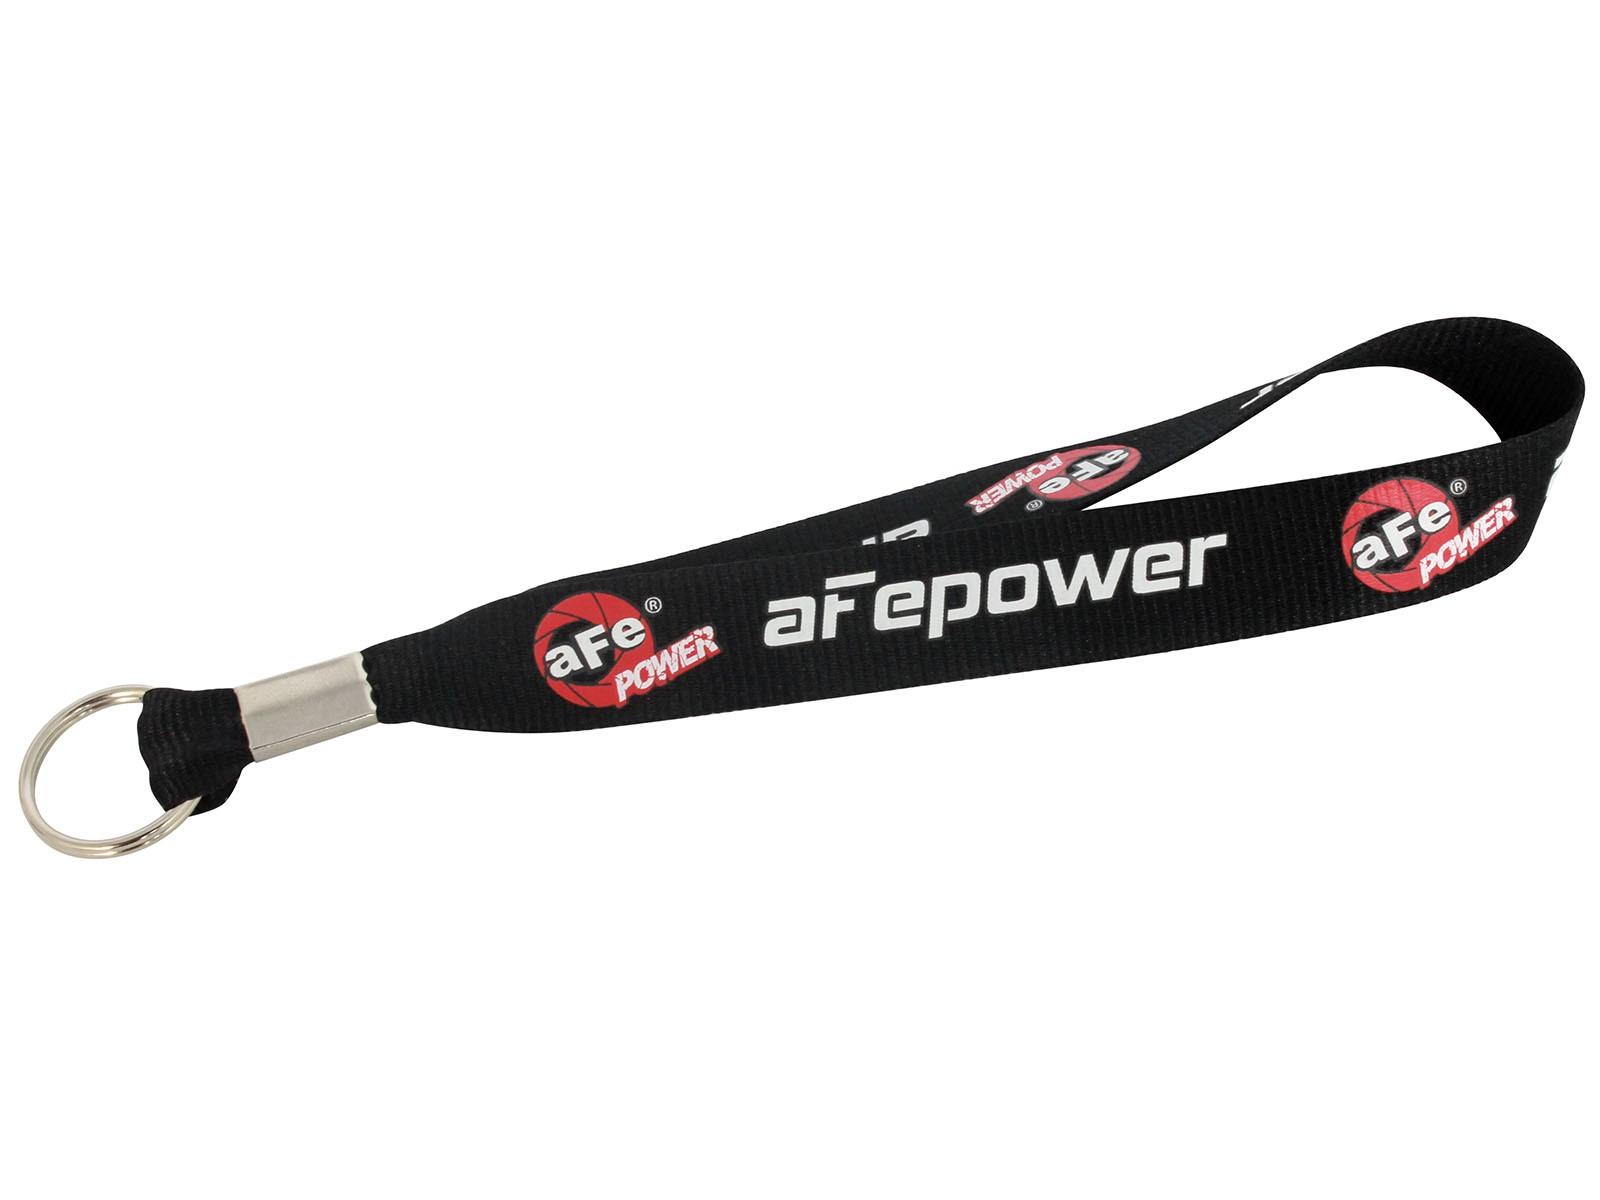 aFe POWER 40-10151 Mini Lanyard-Keychain